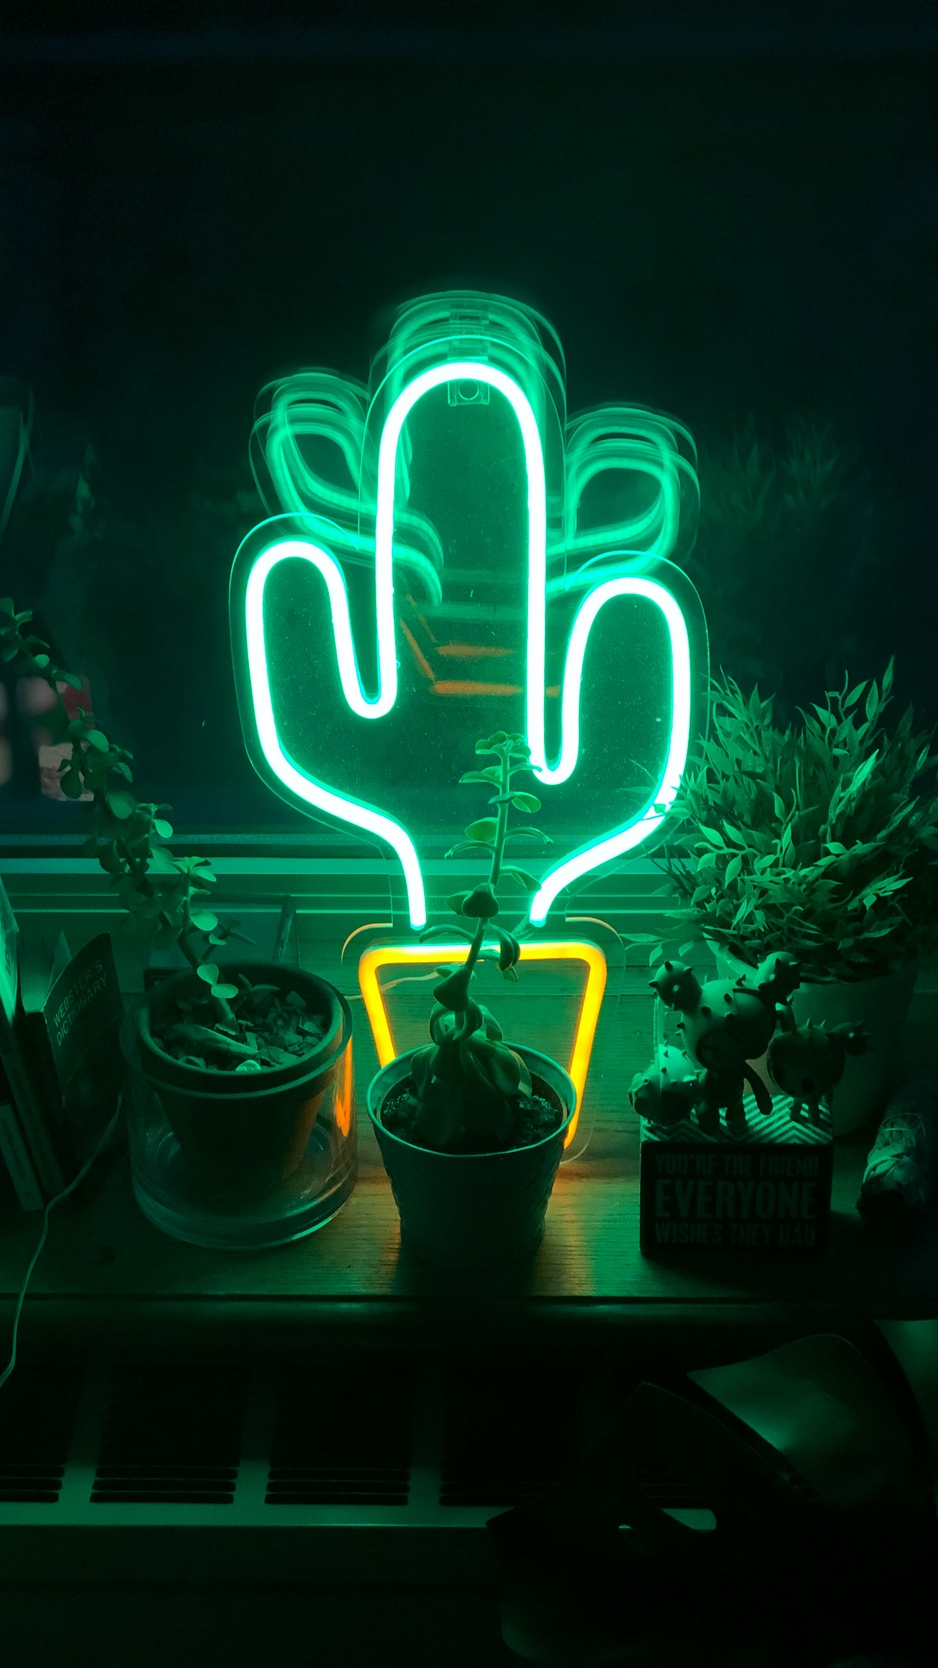 Wallpaper Neon, Cactus, Flowers, Light, Green - Cool Neon Sign Wallpaper For Android - HD Wallpaper